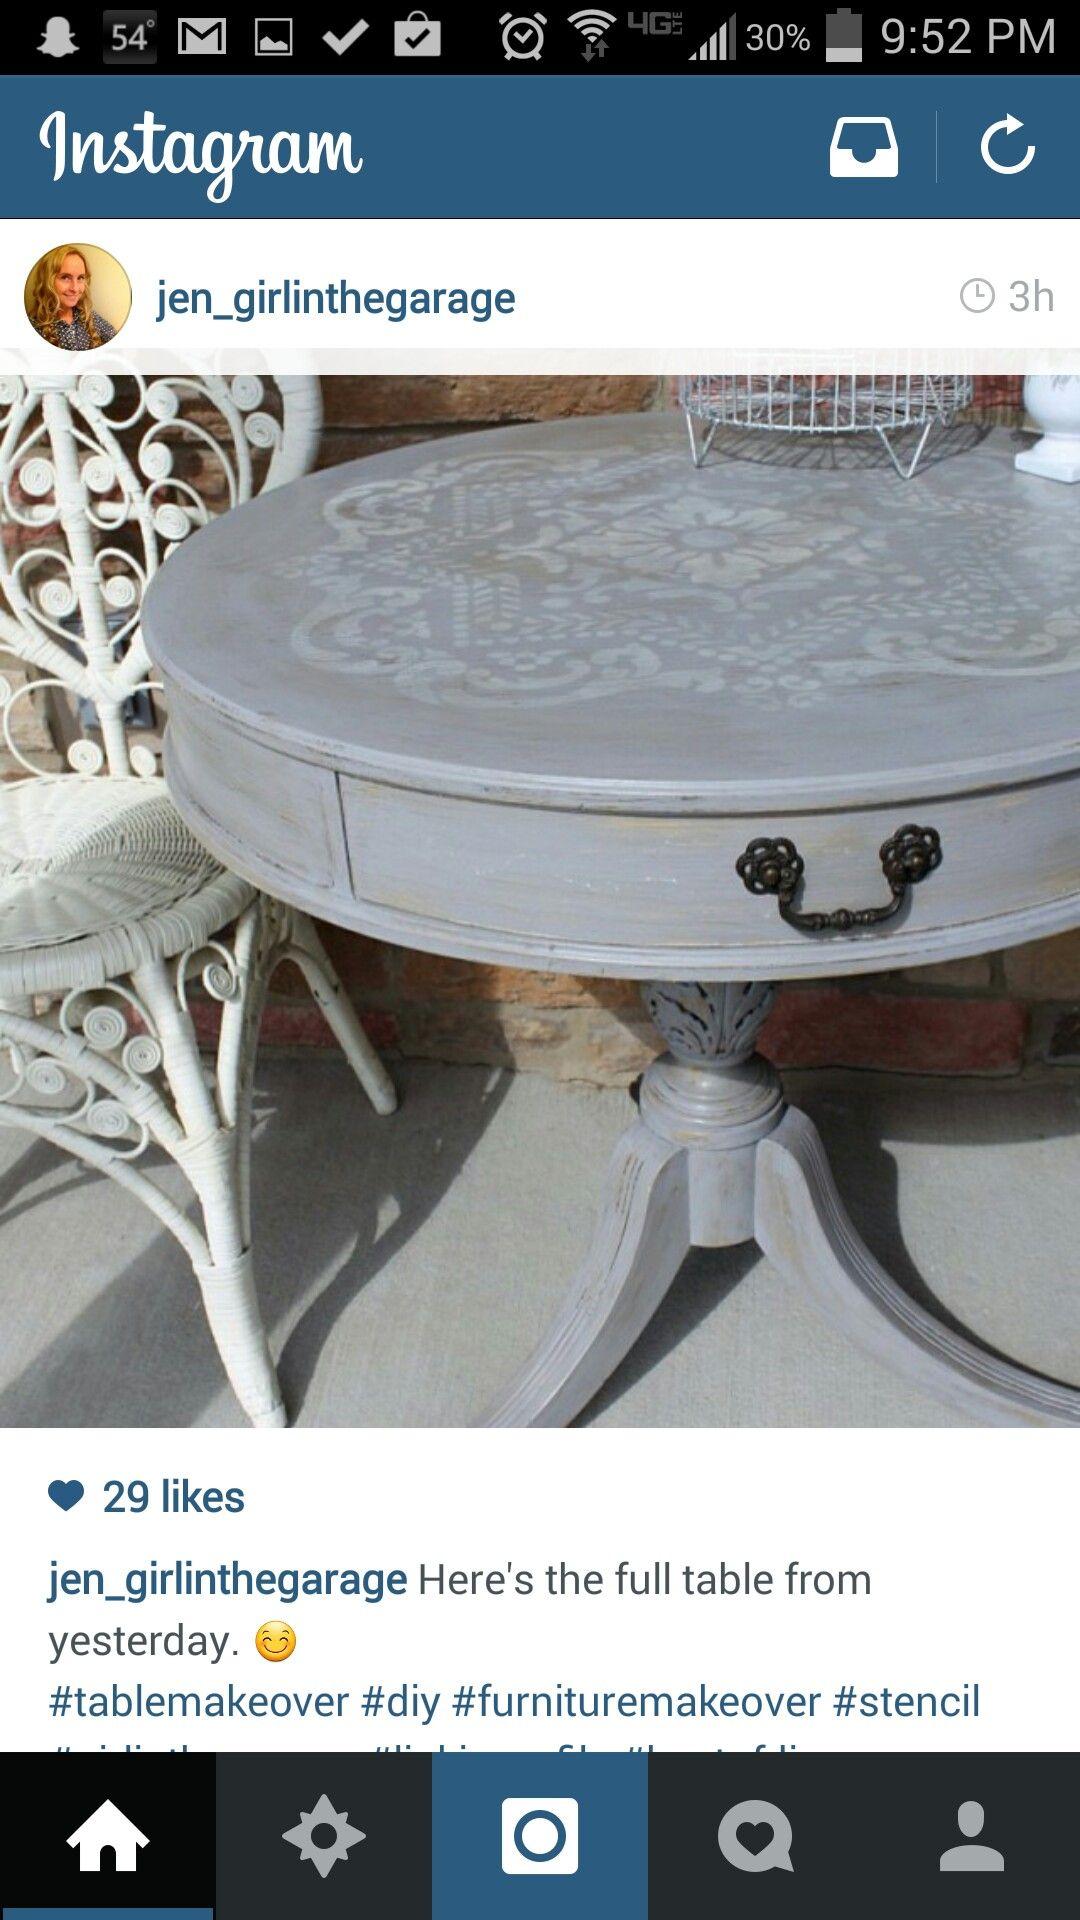 Stencil on round table